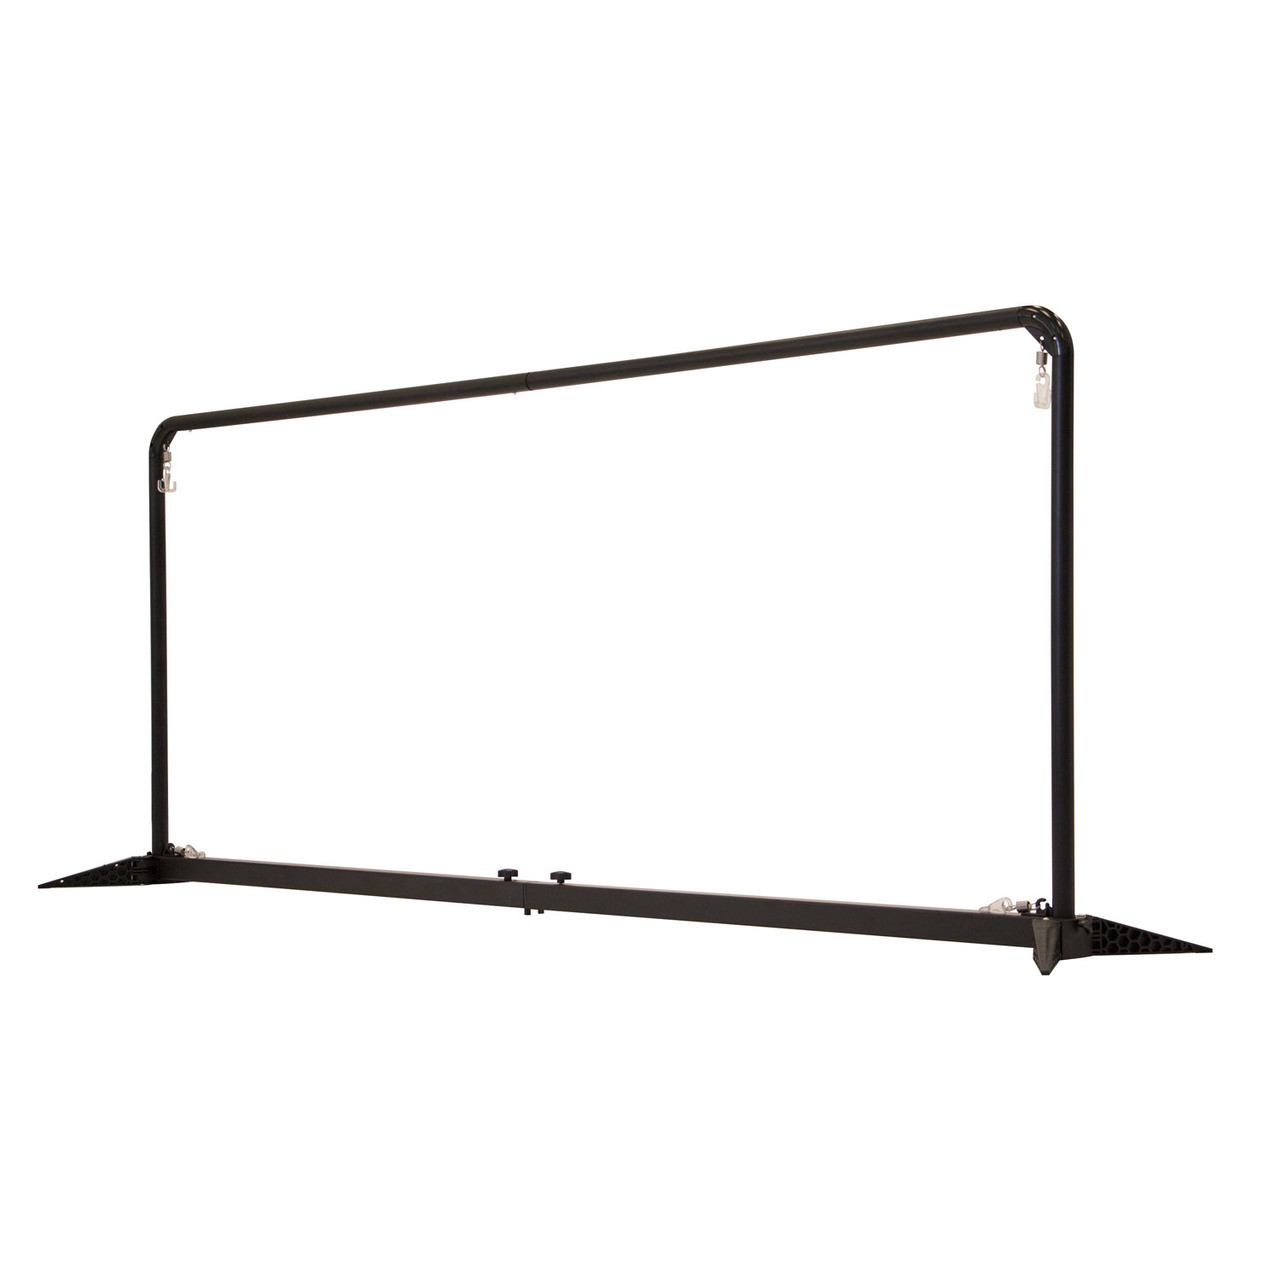 7' FrameWorx Barrier Hardware Angled View